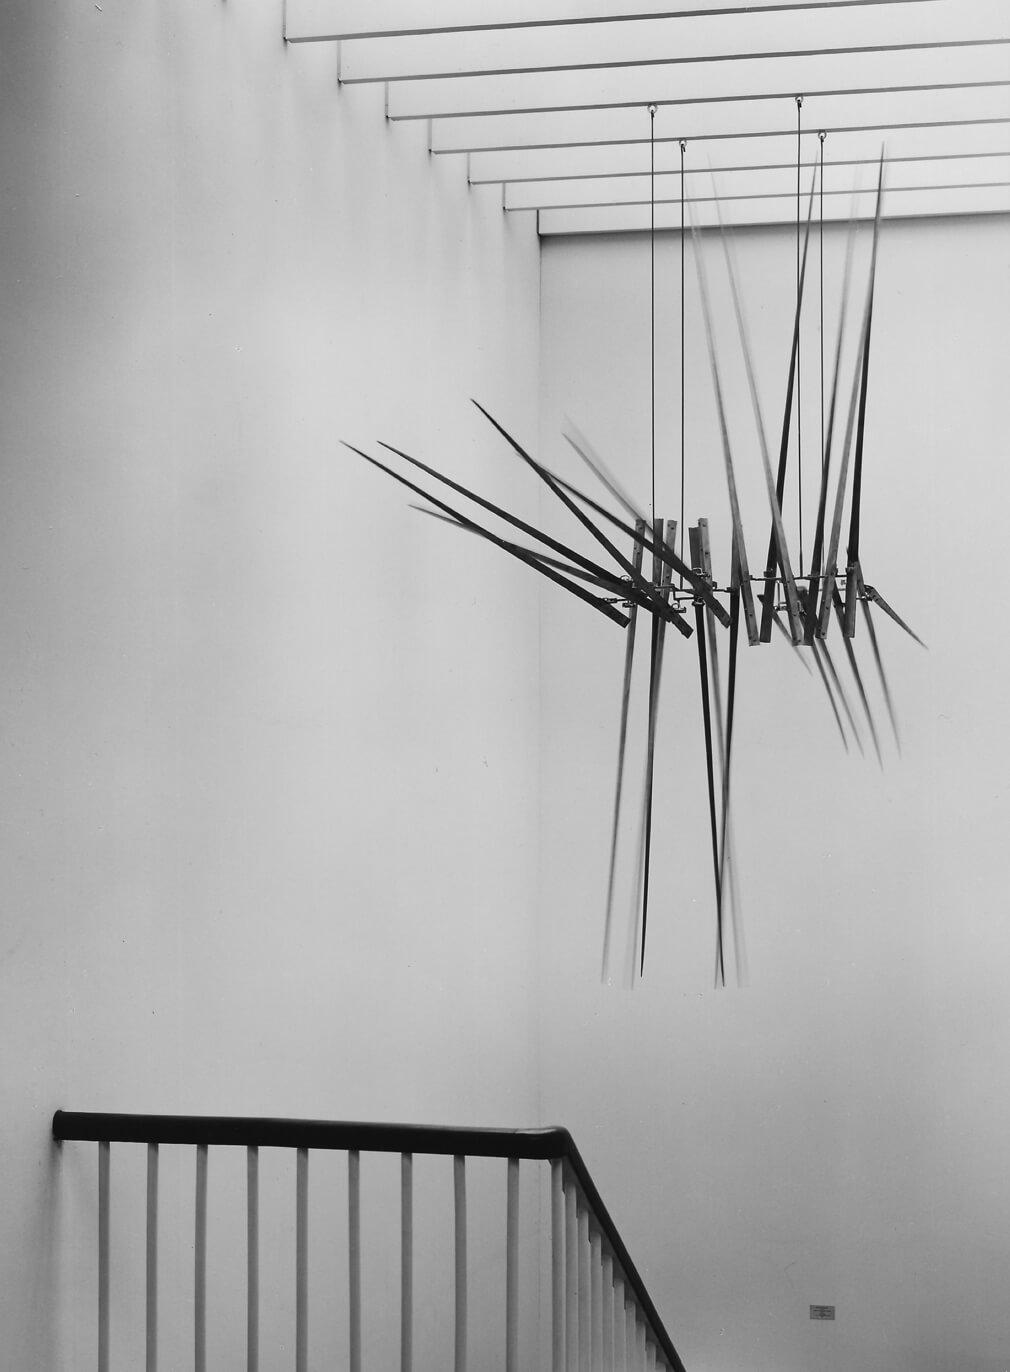 Twenty-Four Lines (1963), Hamburger Kunsthalle, Hamburg,Germany